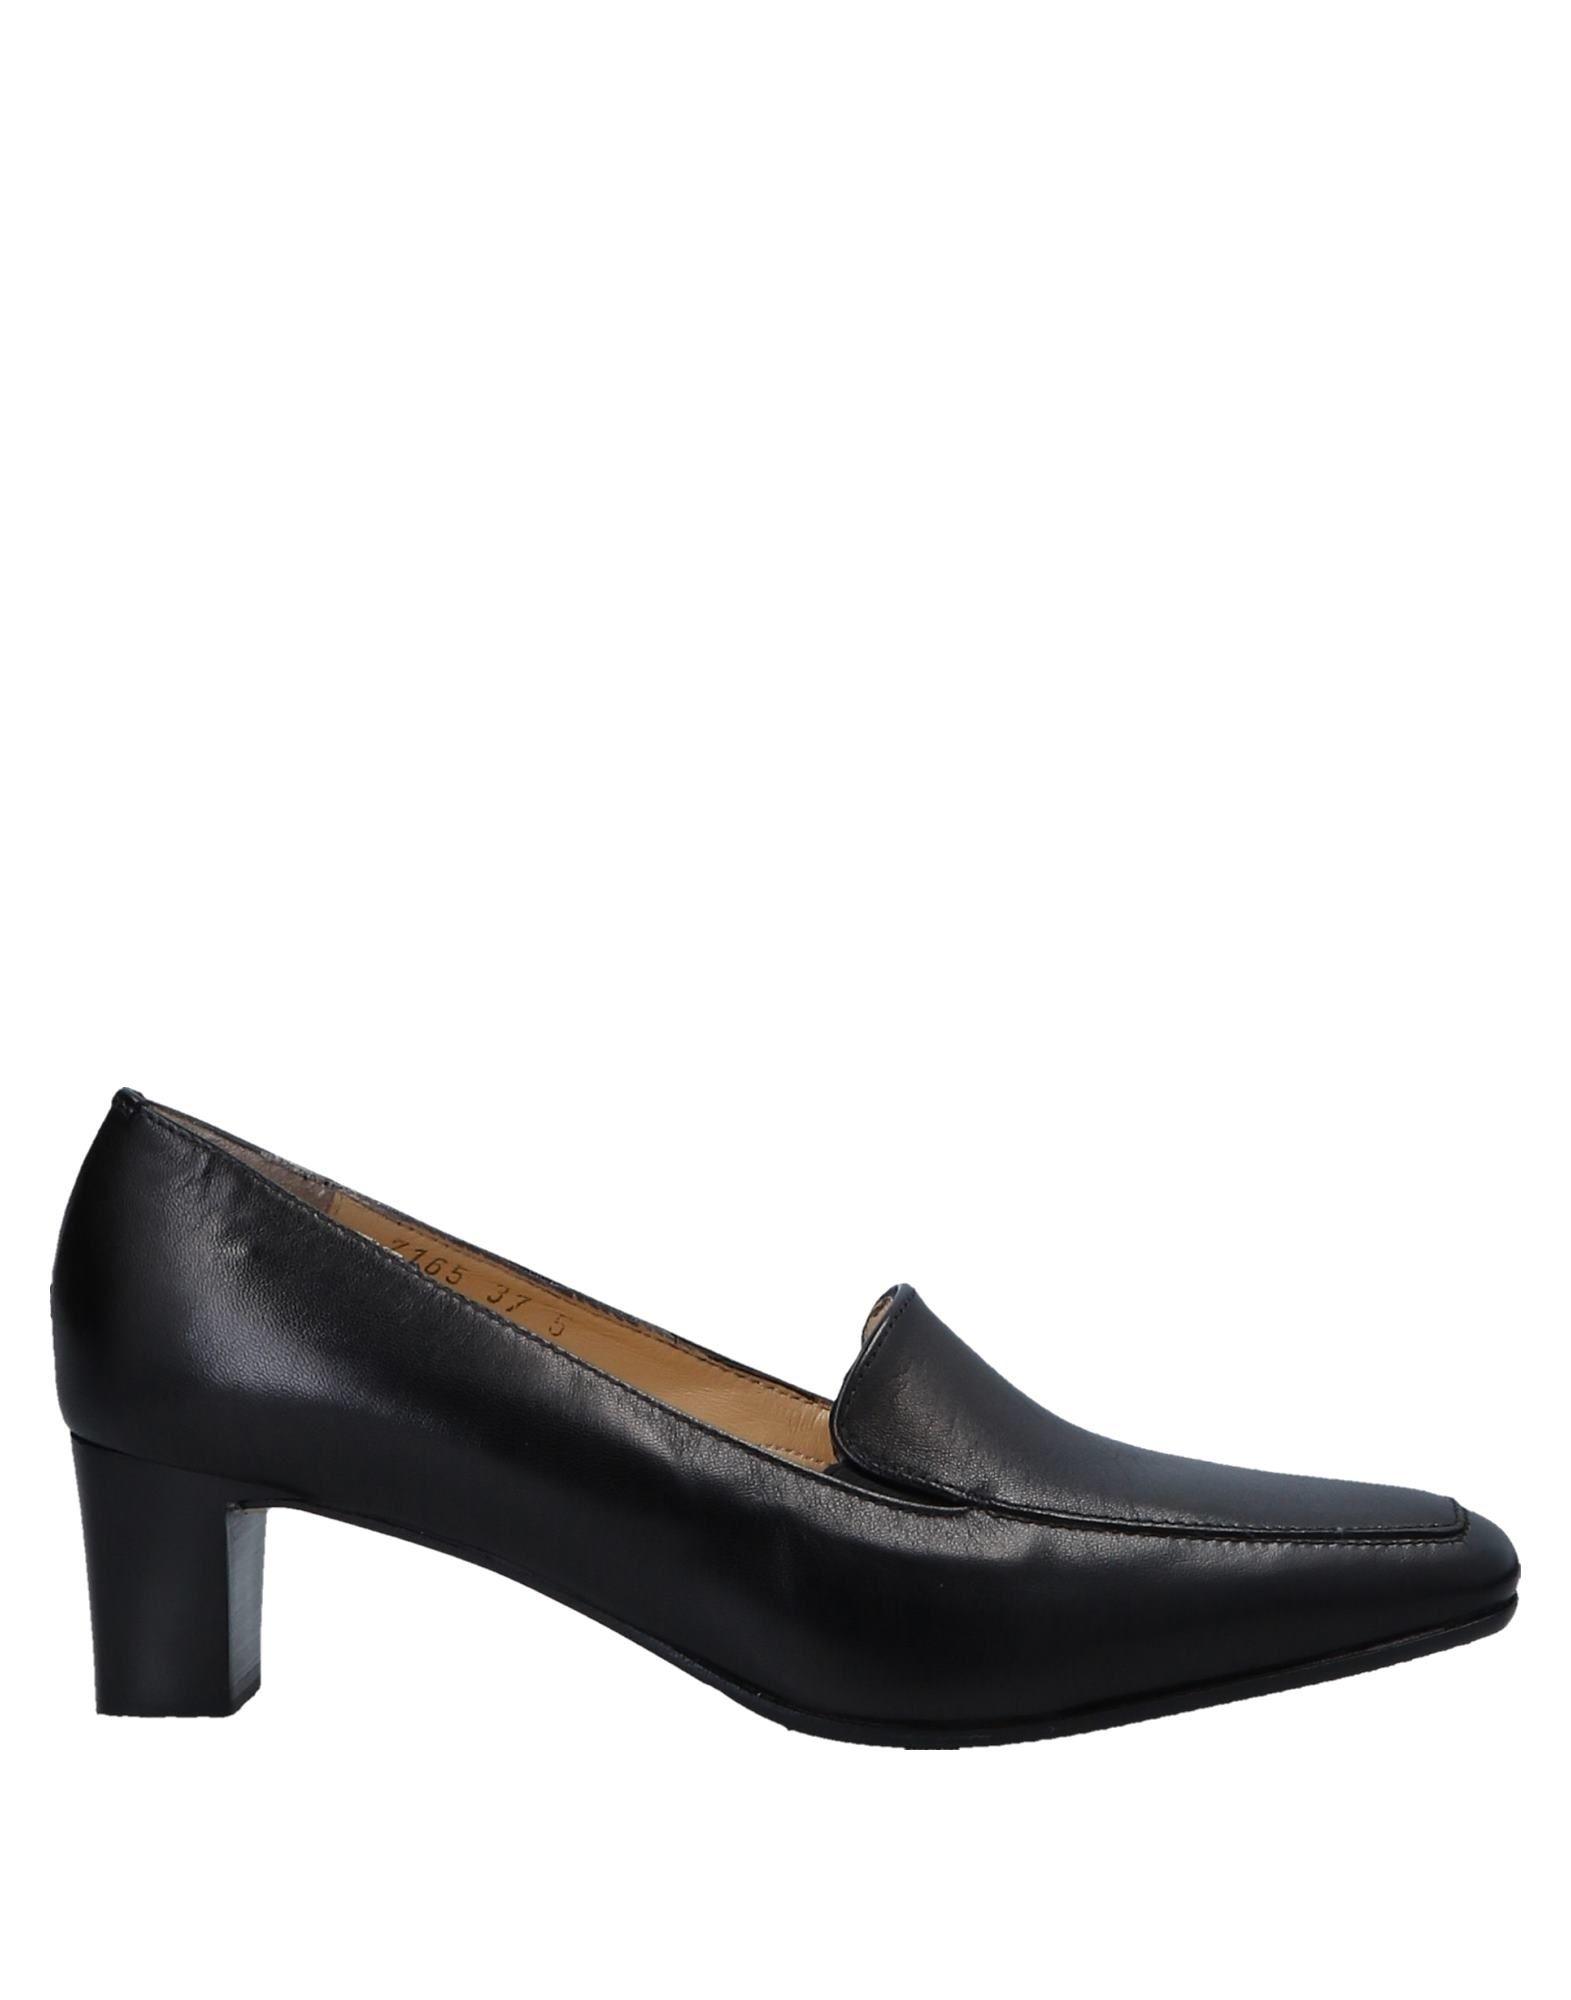 Valleverde Mokassins Damen  11552568WO Gute Qualität beliebte Schuhe